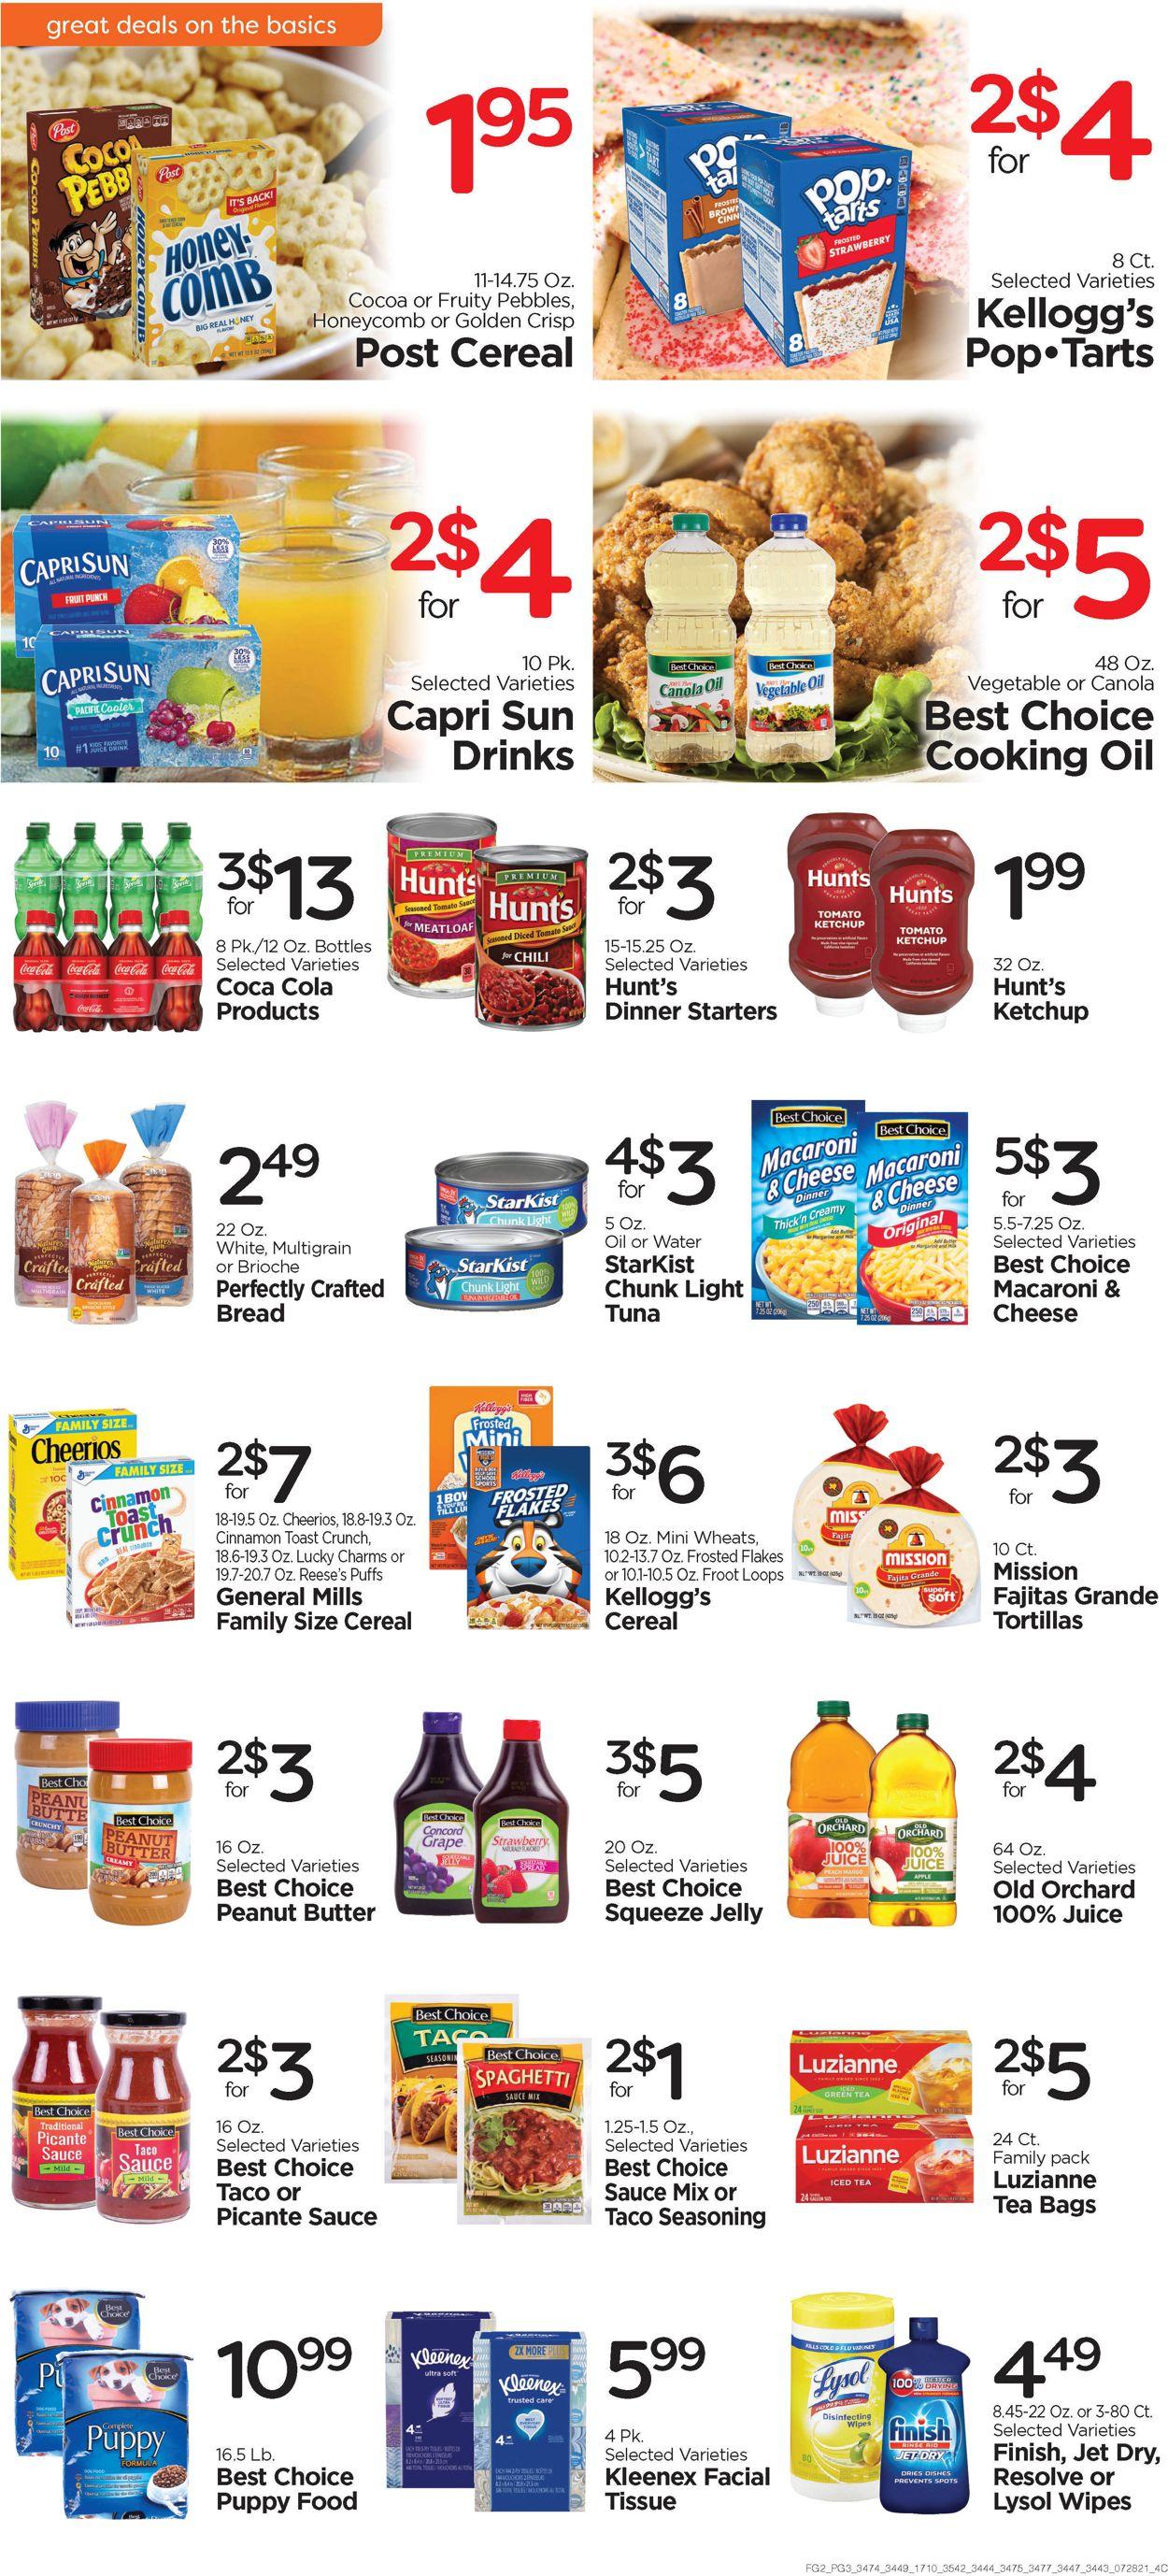 Edwards Food Giant Weekly Ad Circular - valid 07/28-08/03/2021 (Page 3)